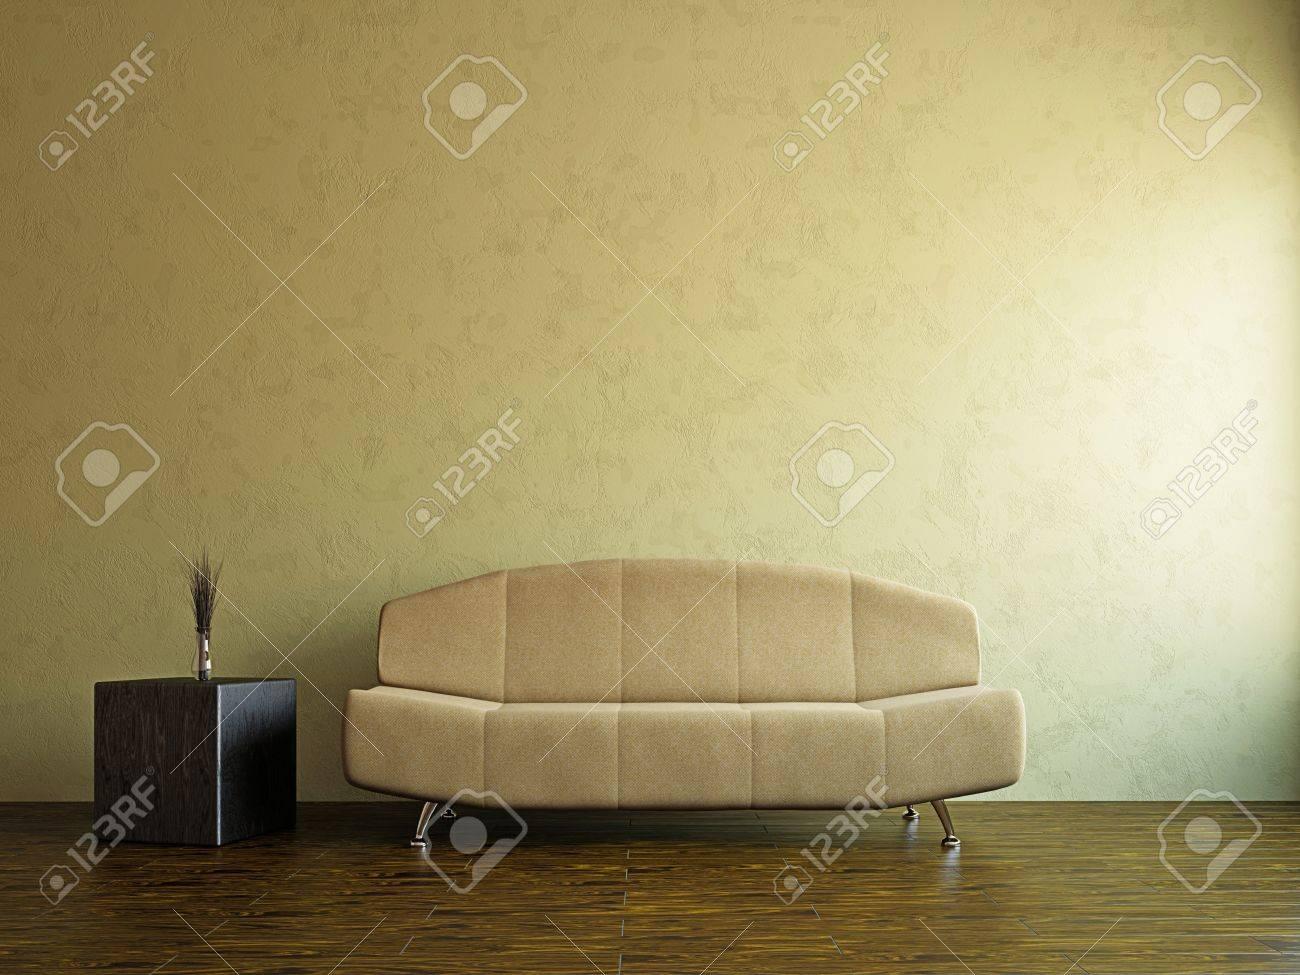 Yellow sofa in the livingroom near the wall Stock Photo - 17742765